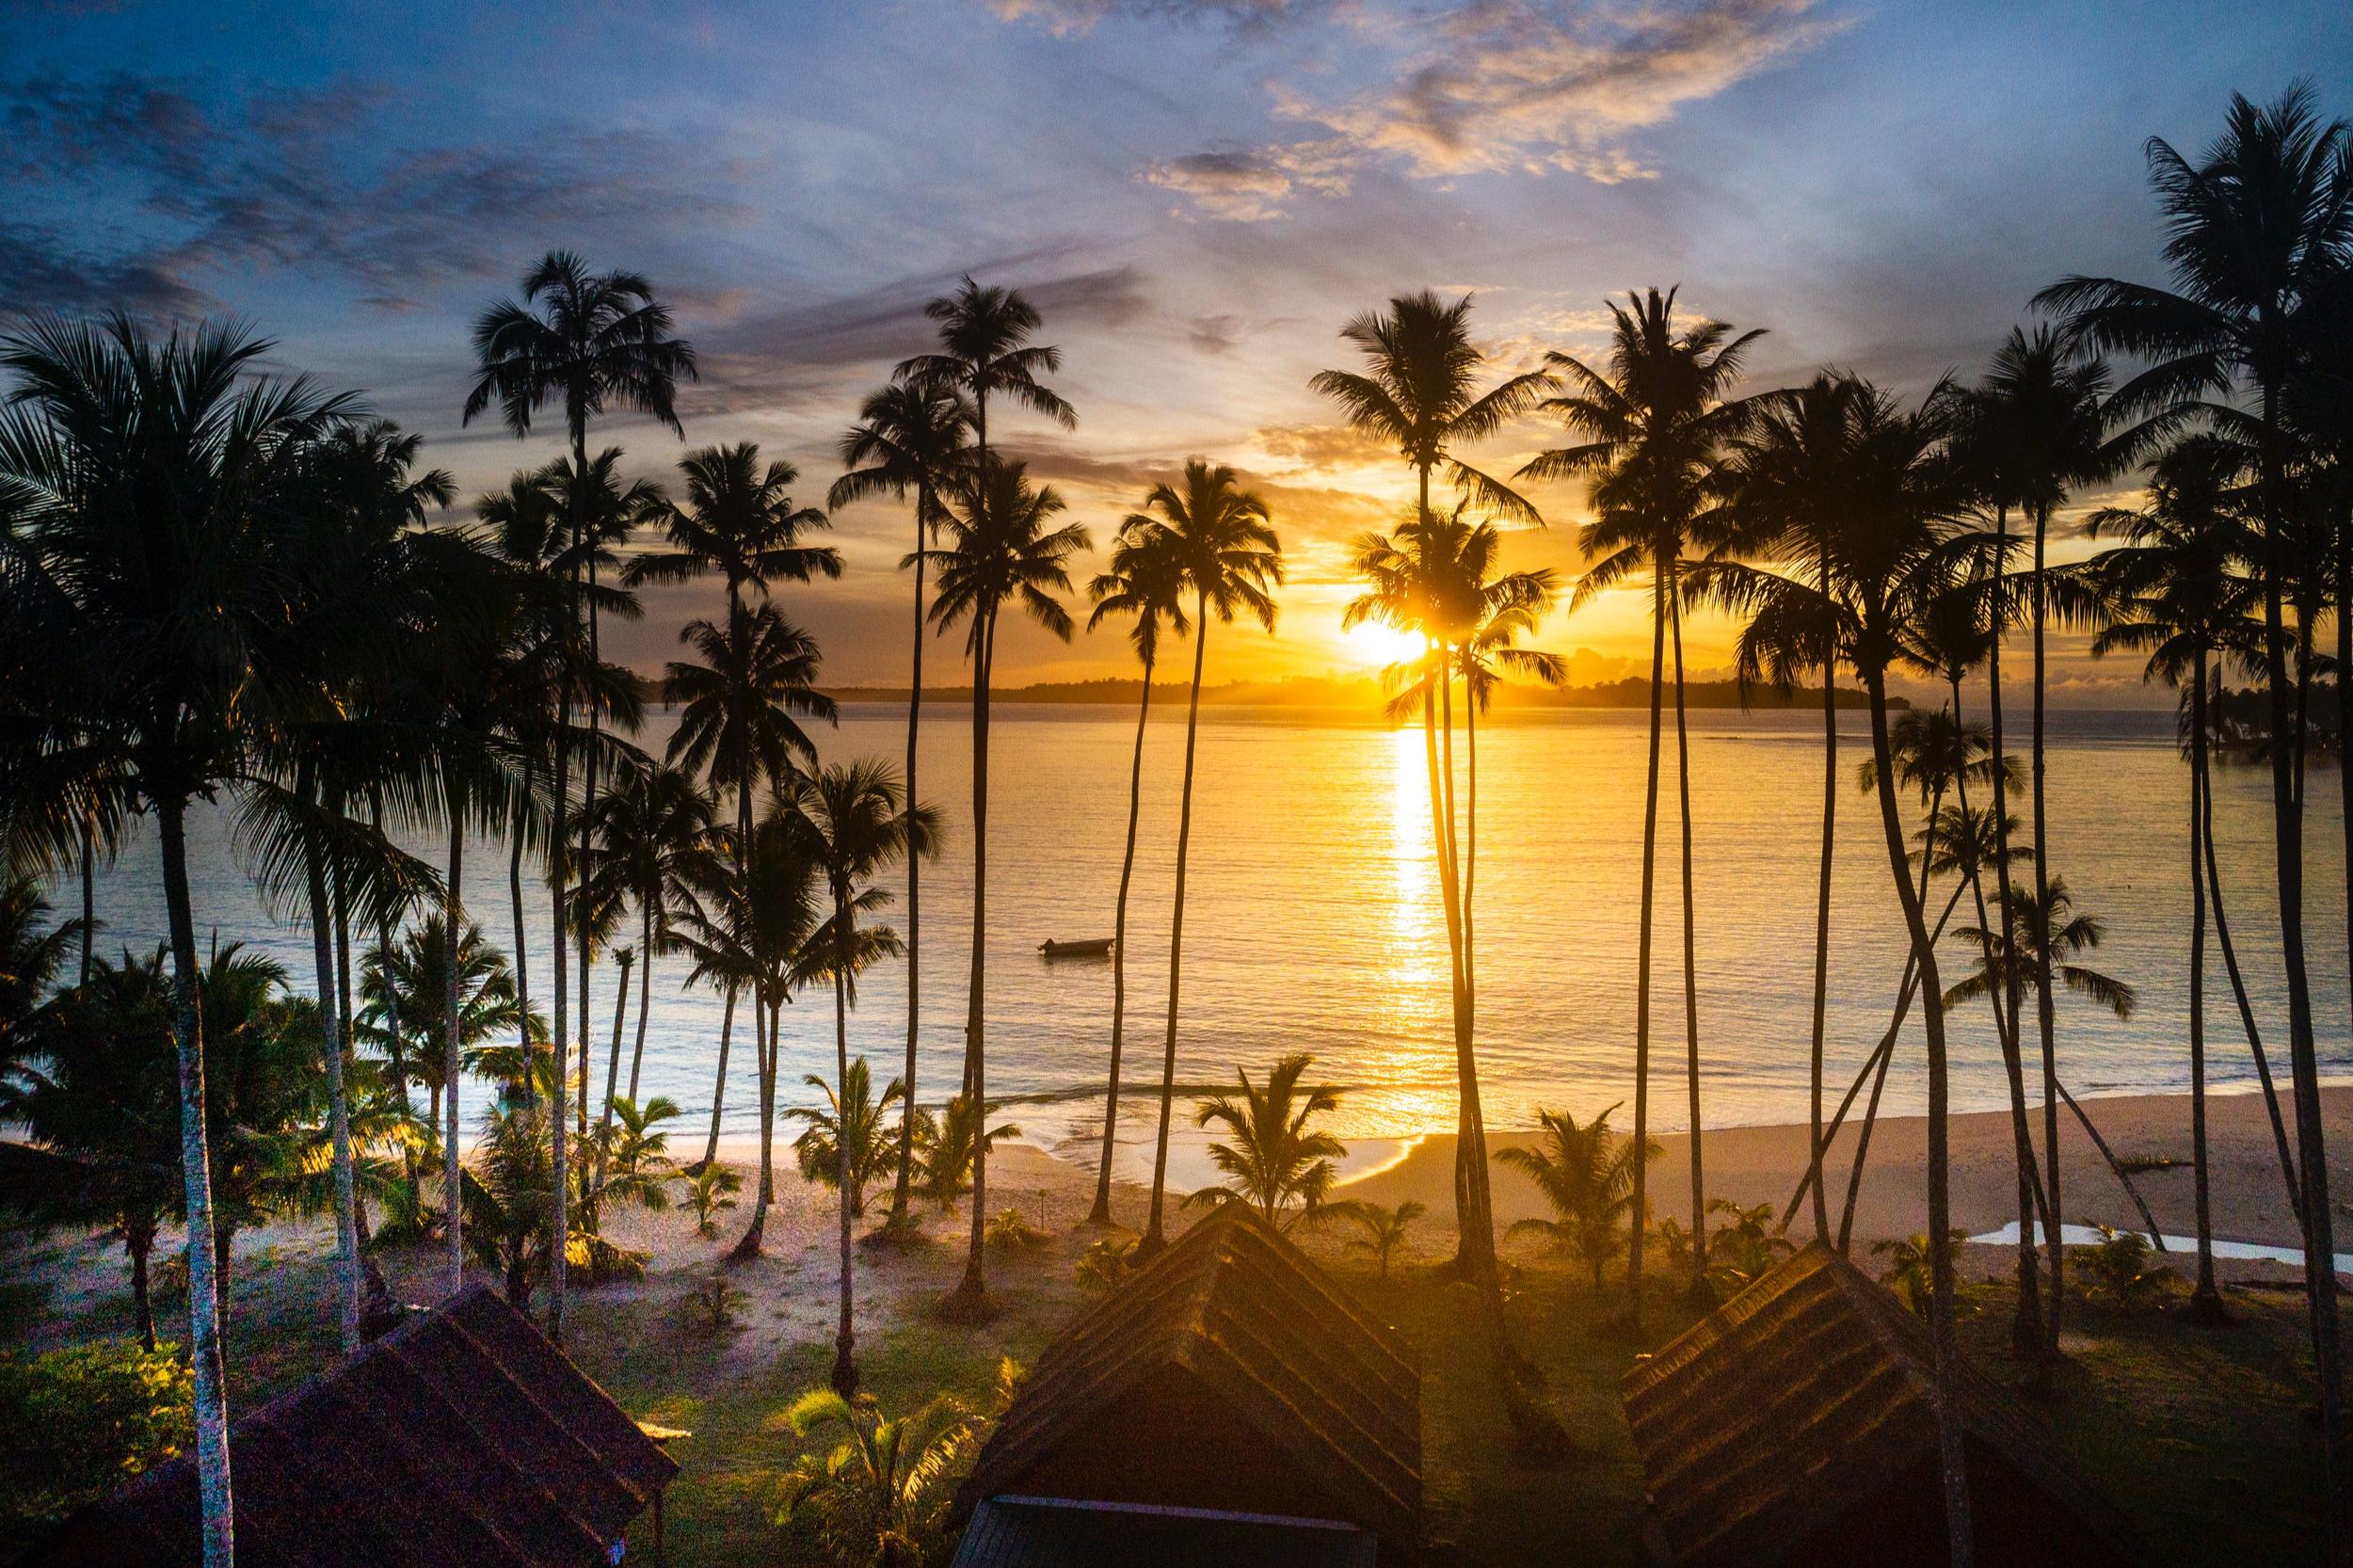 Southern Telo - Indonesia